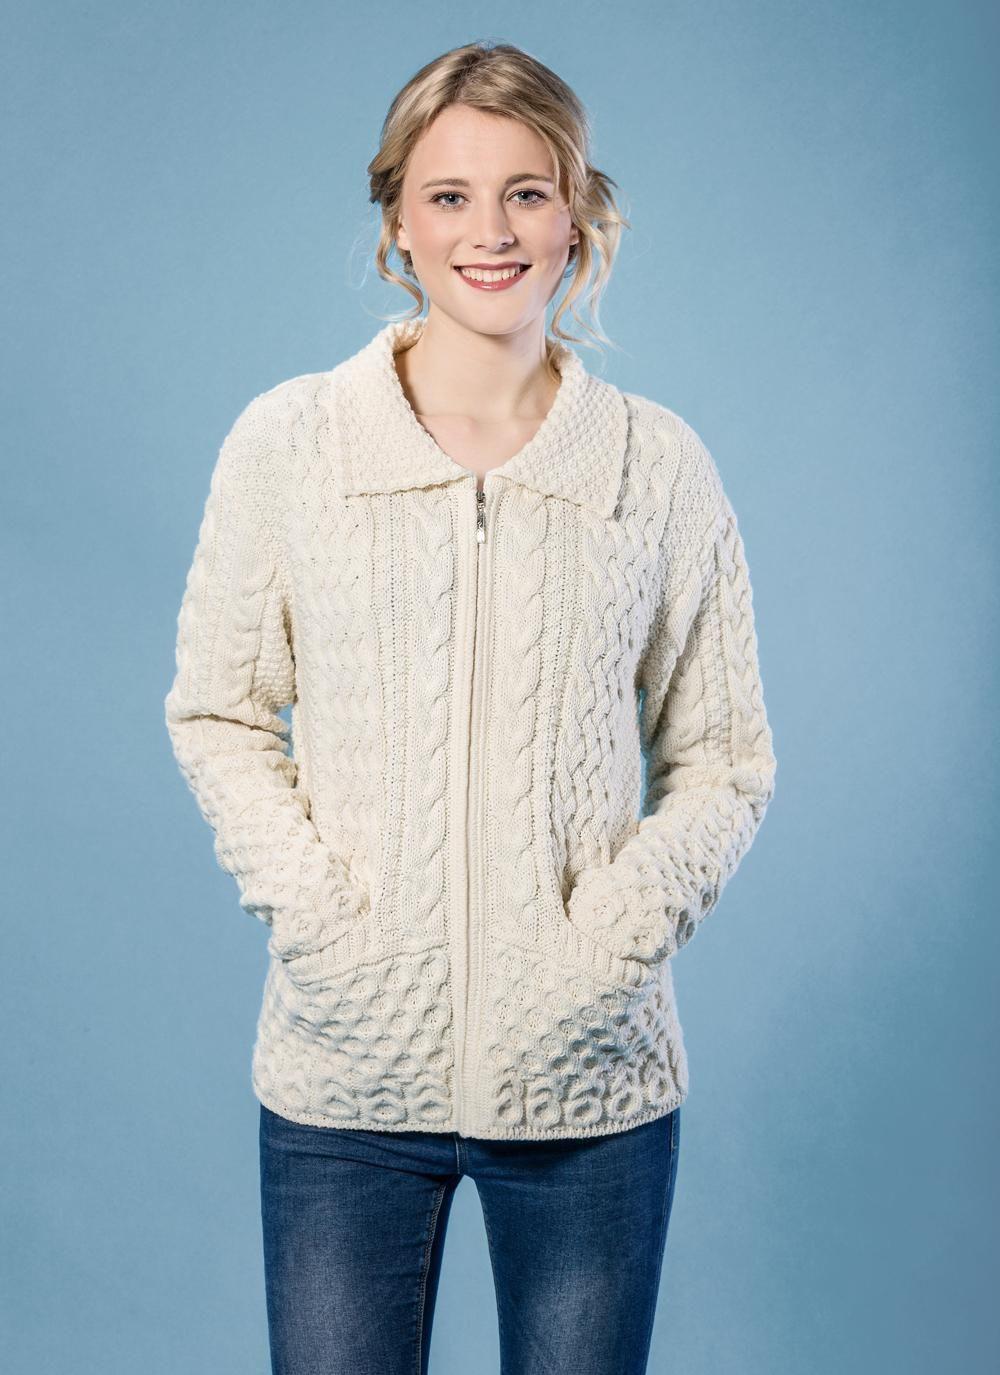 Grace Zip Aran Sweater | Autumn Days | Pinterest | Aran sweaters ...